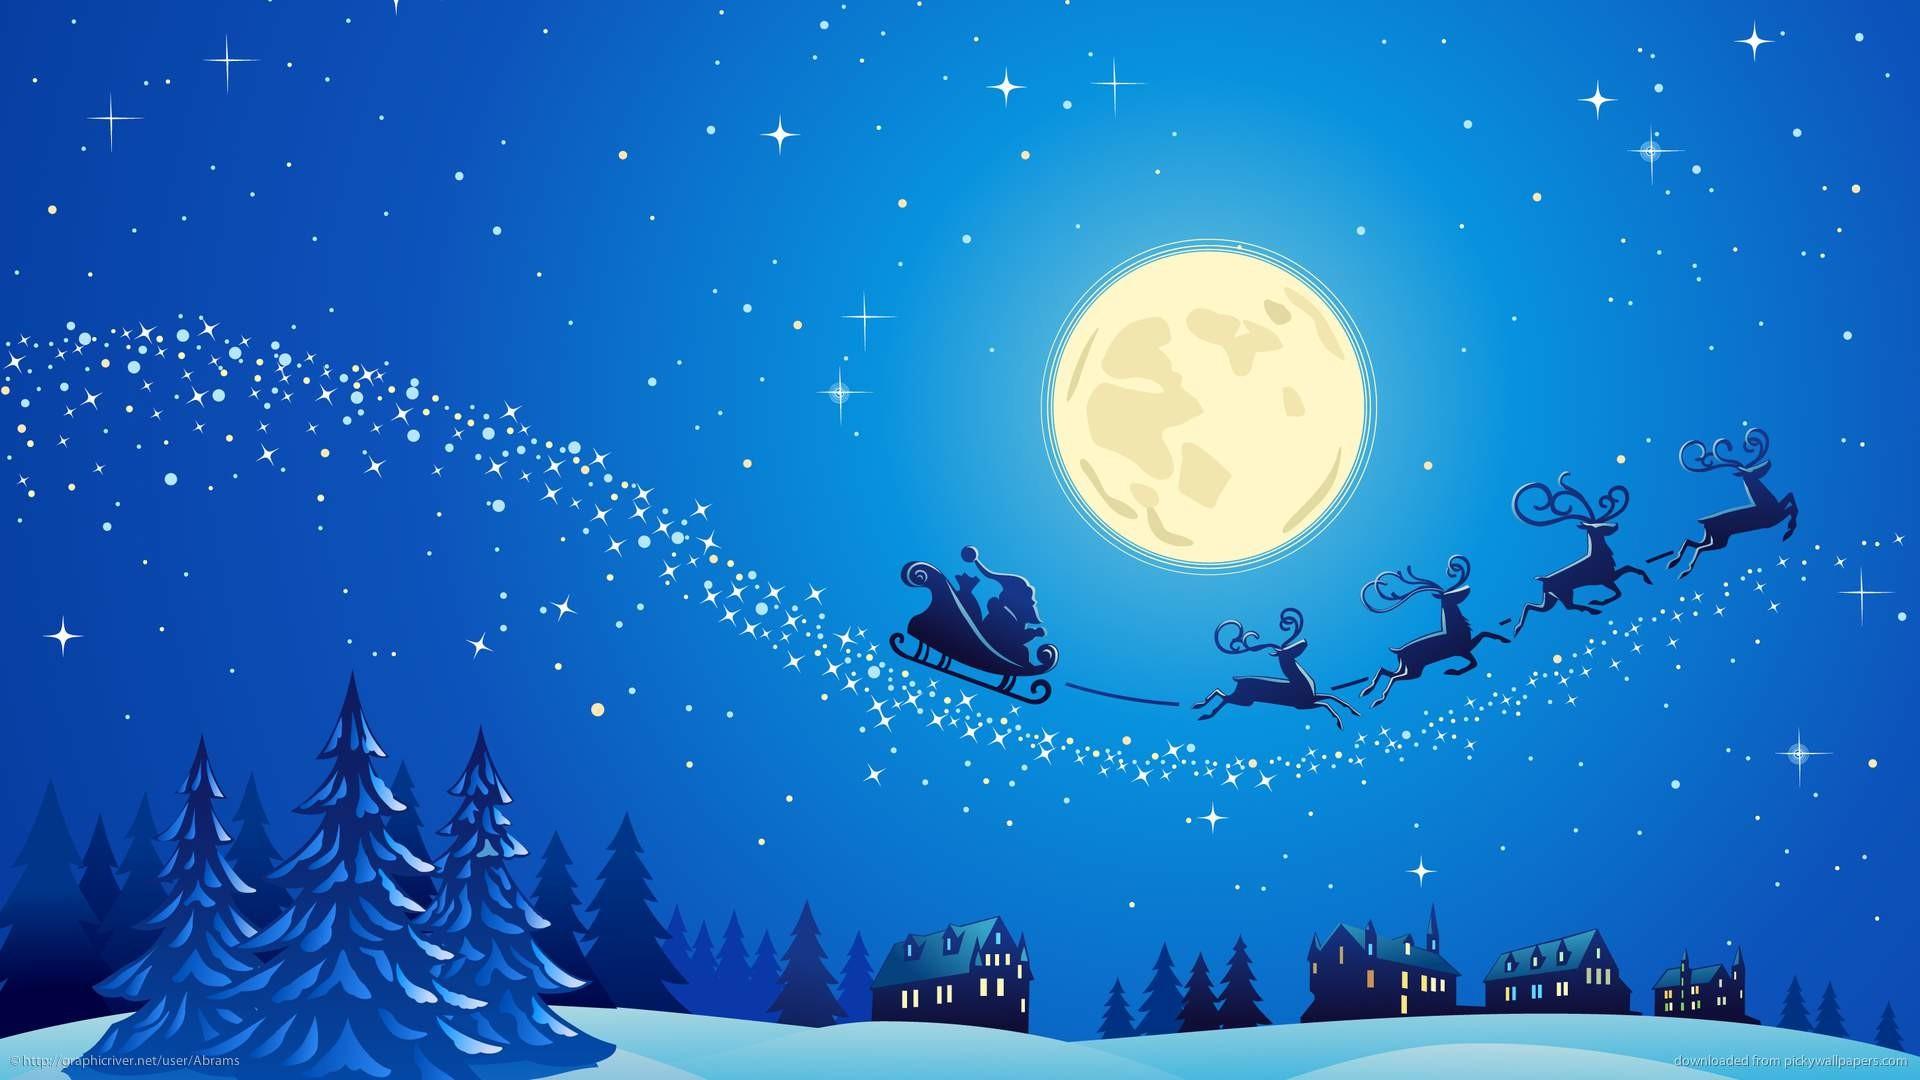 … Christmas Wallpaper 19 …